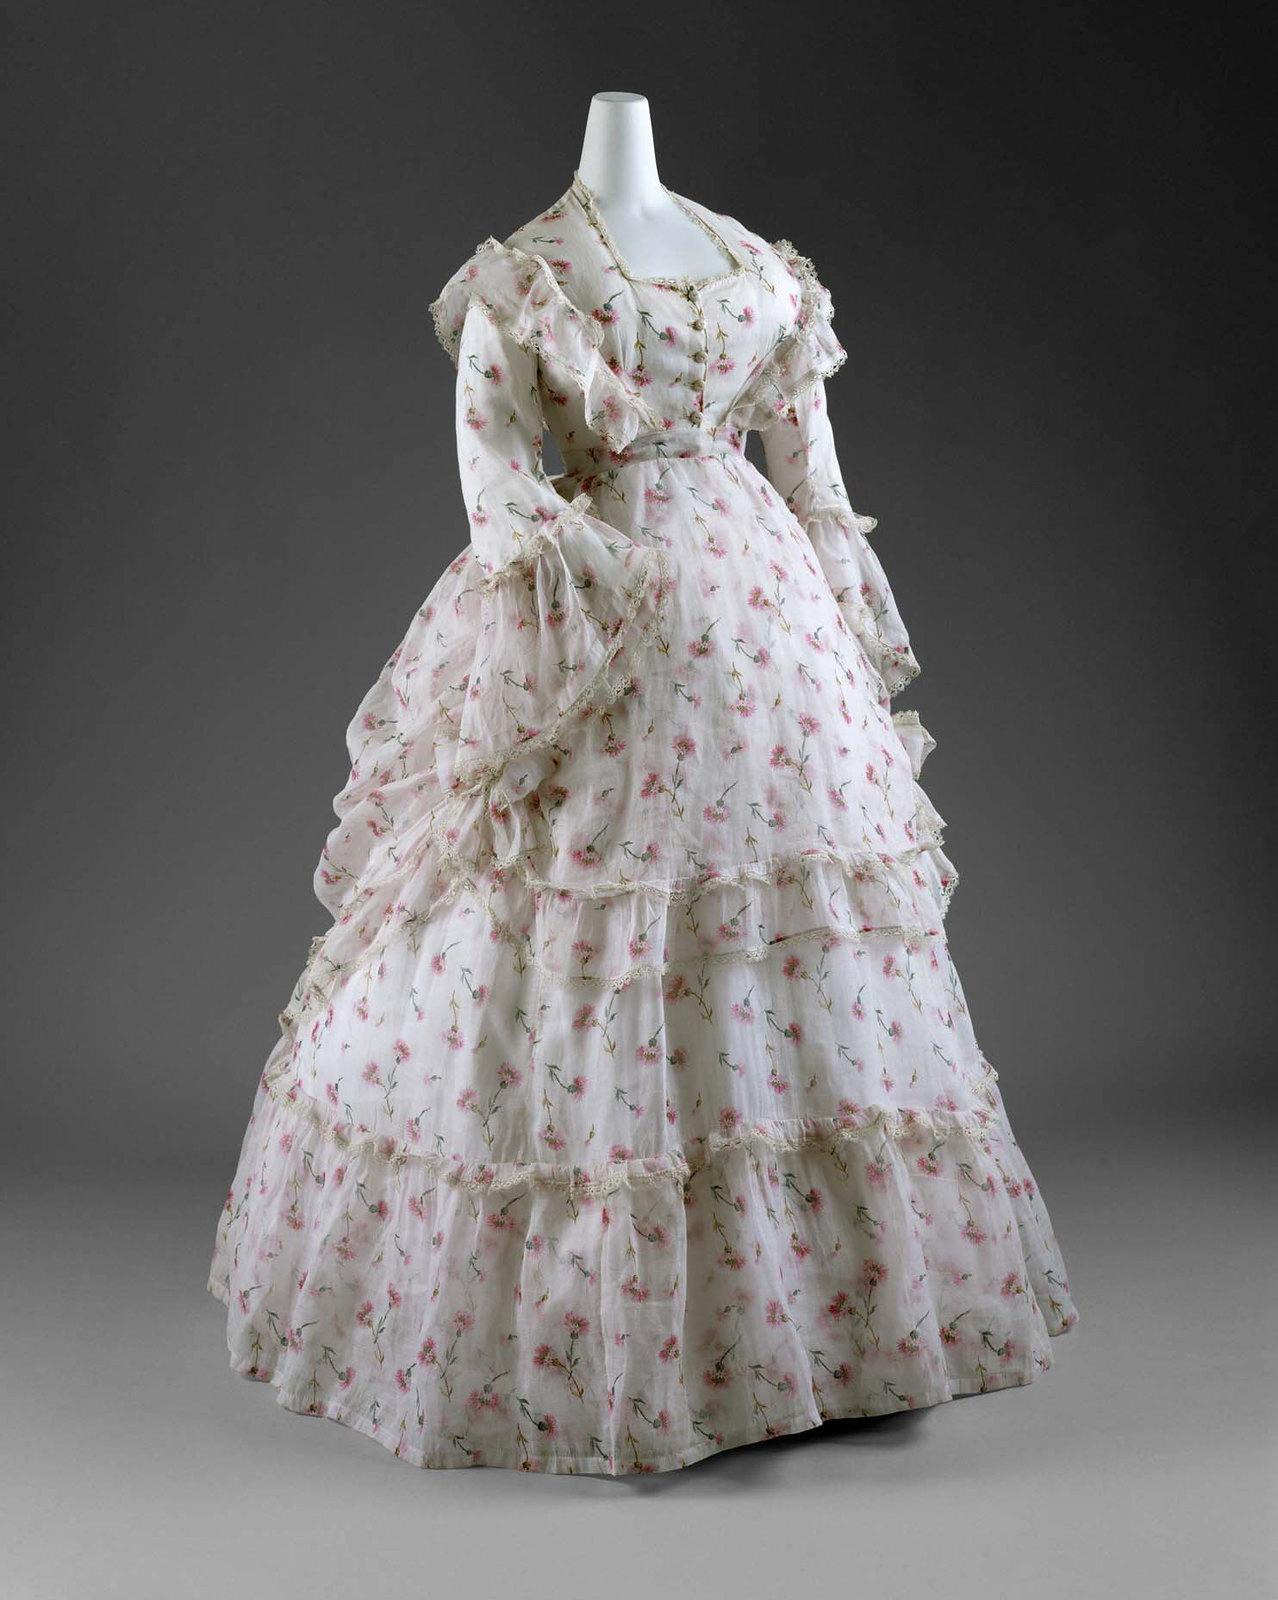 1872, France